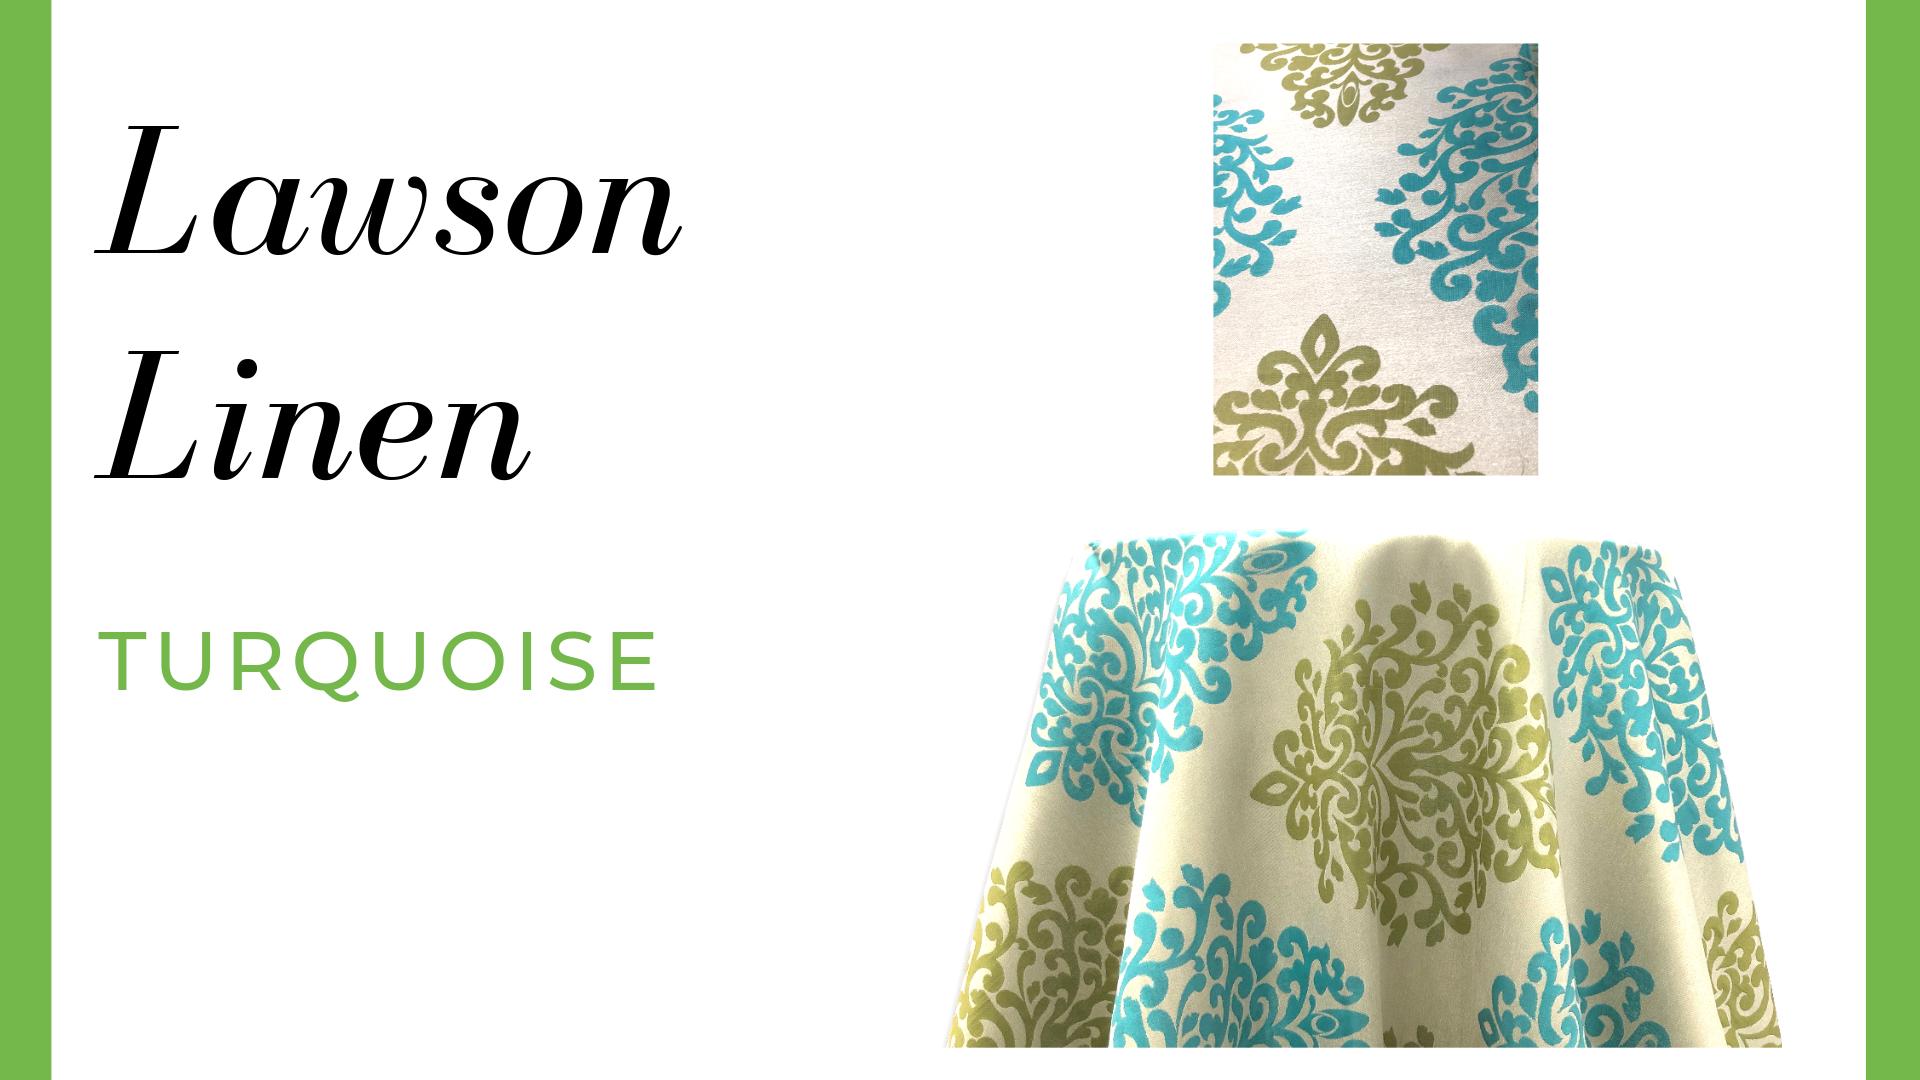 Lawson Linen - Turquoise